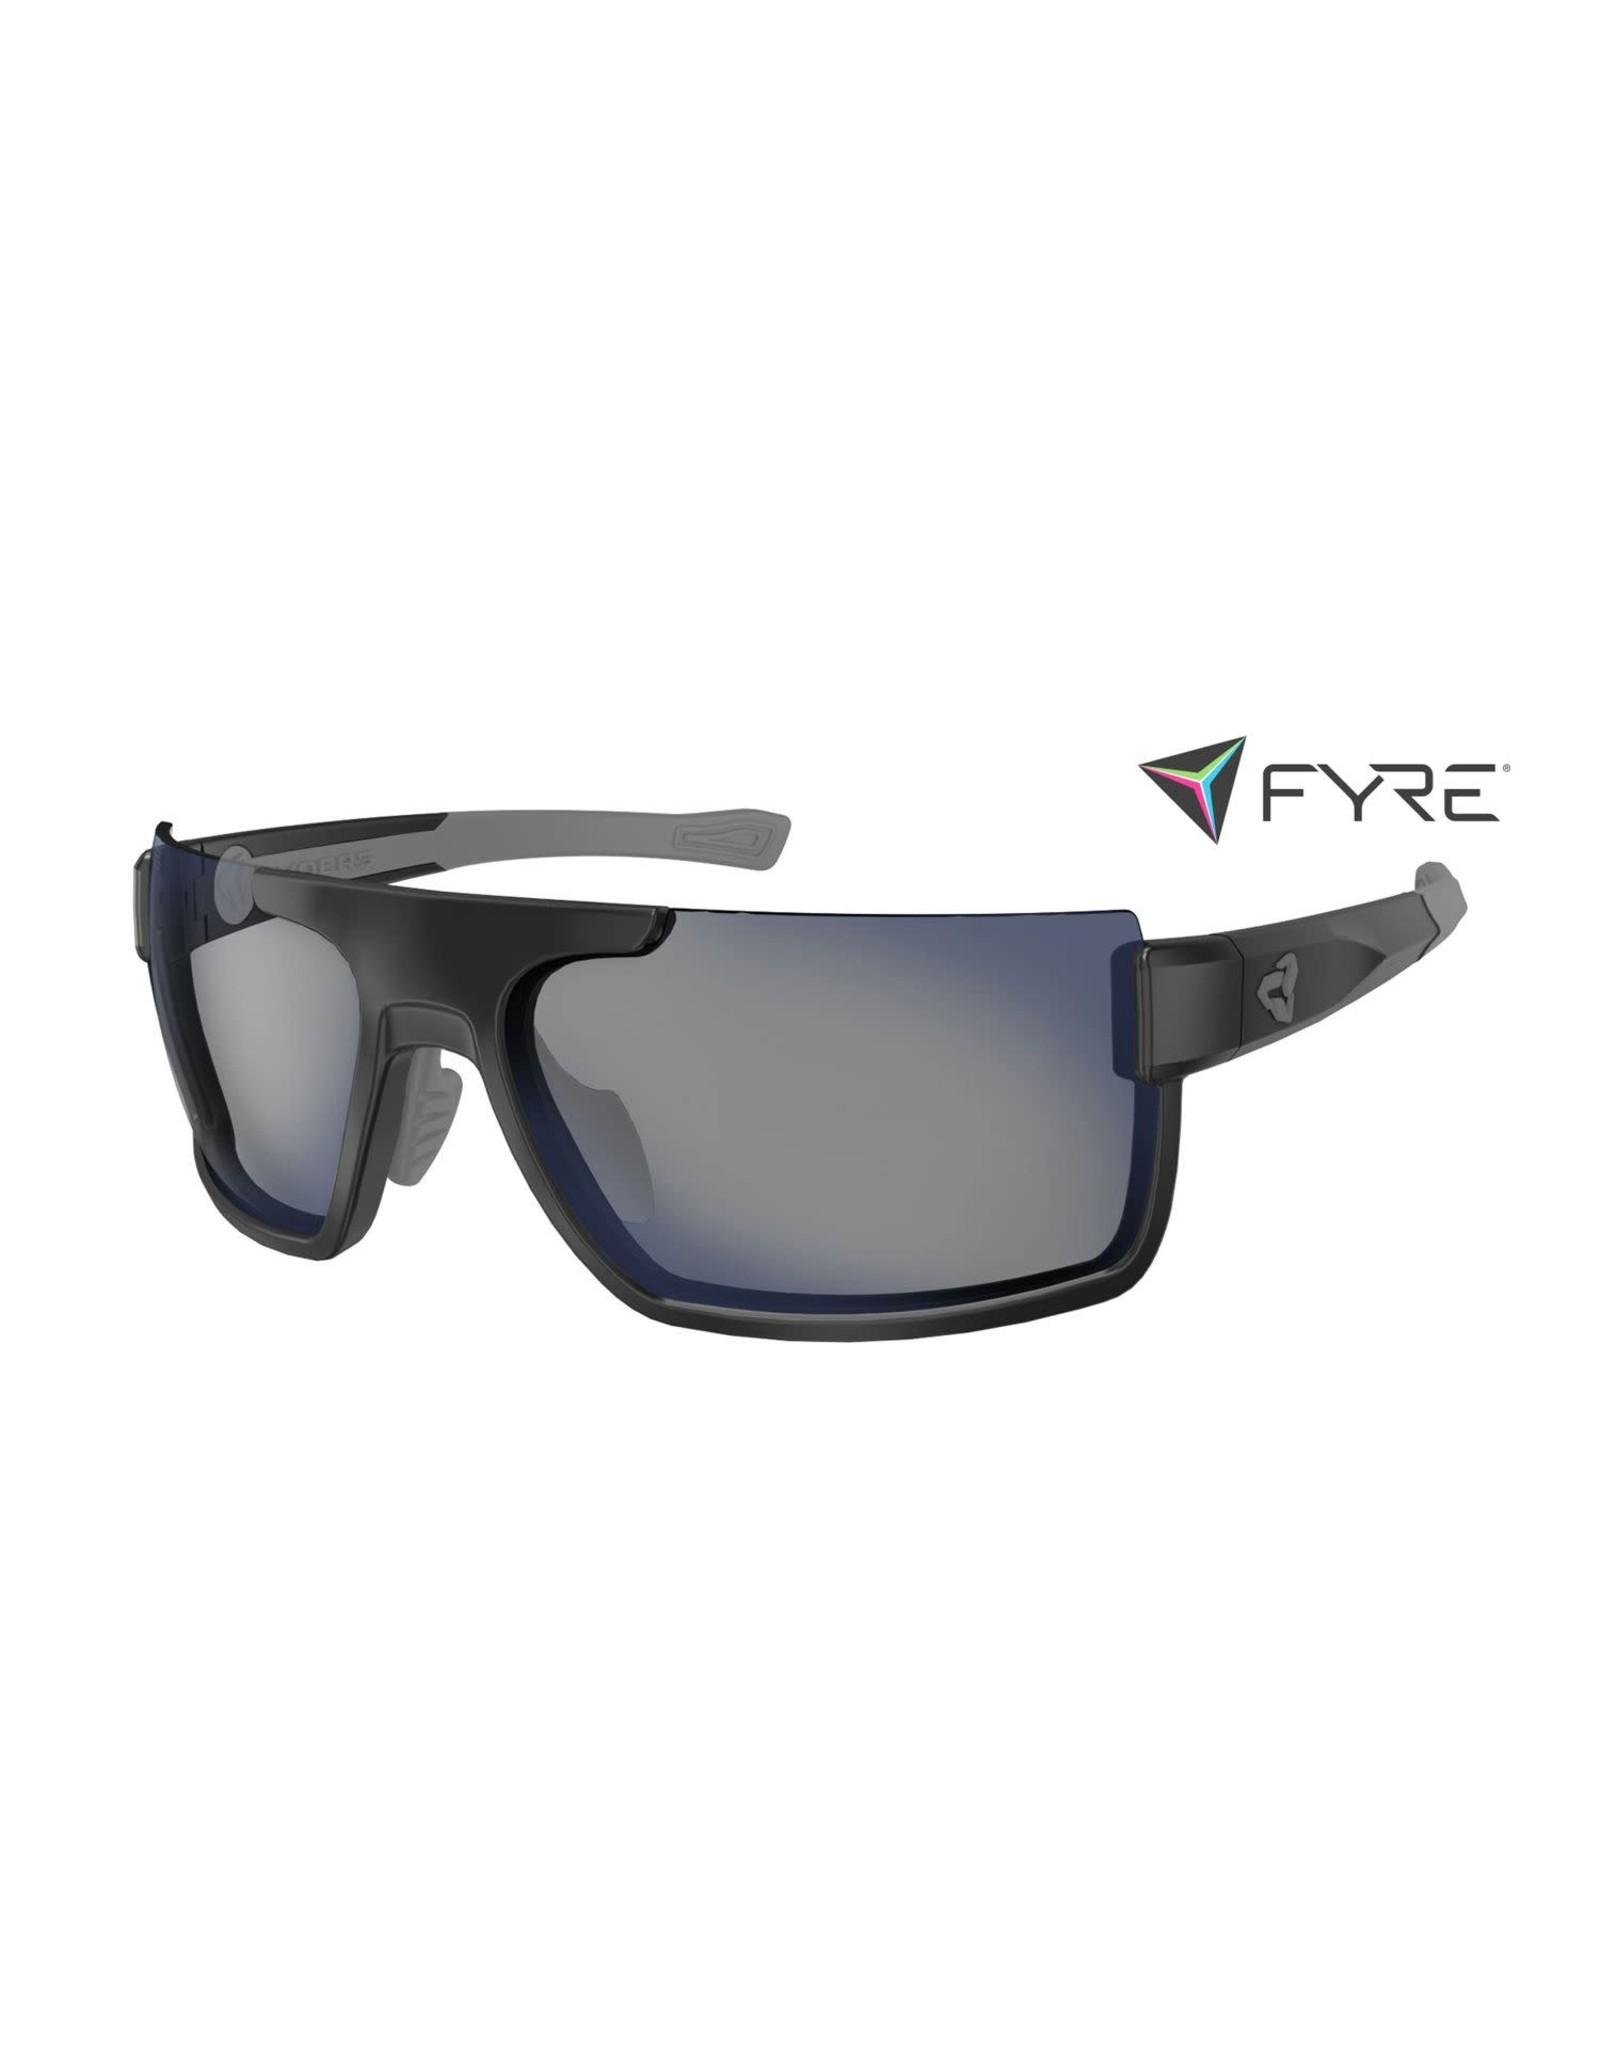 Ryders INCLINE FYRE